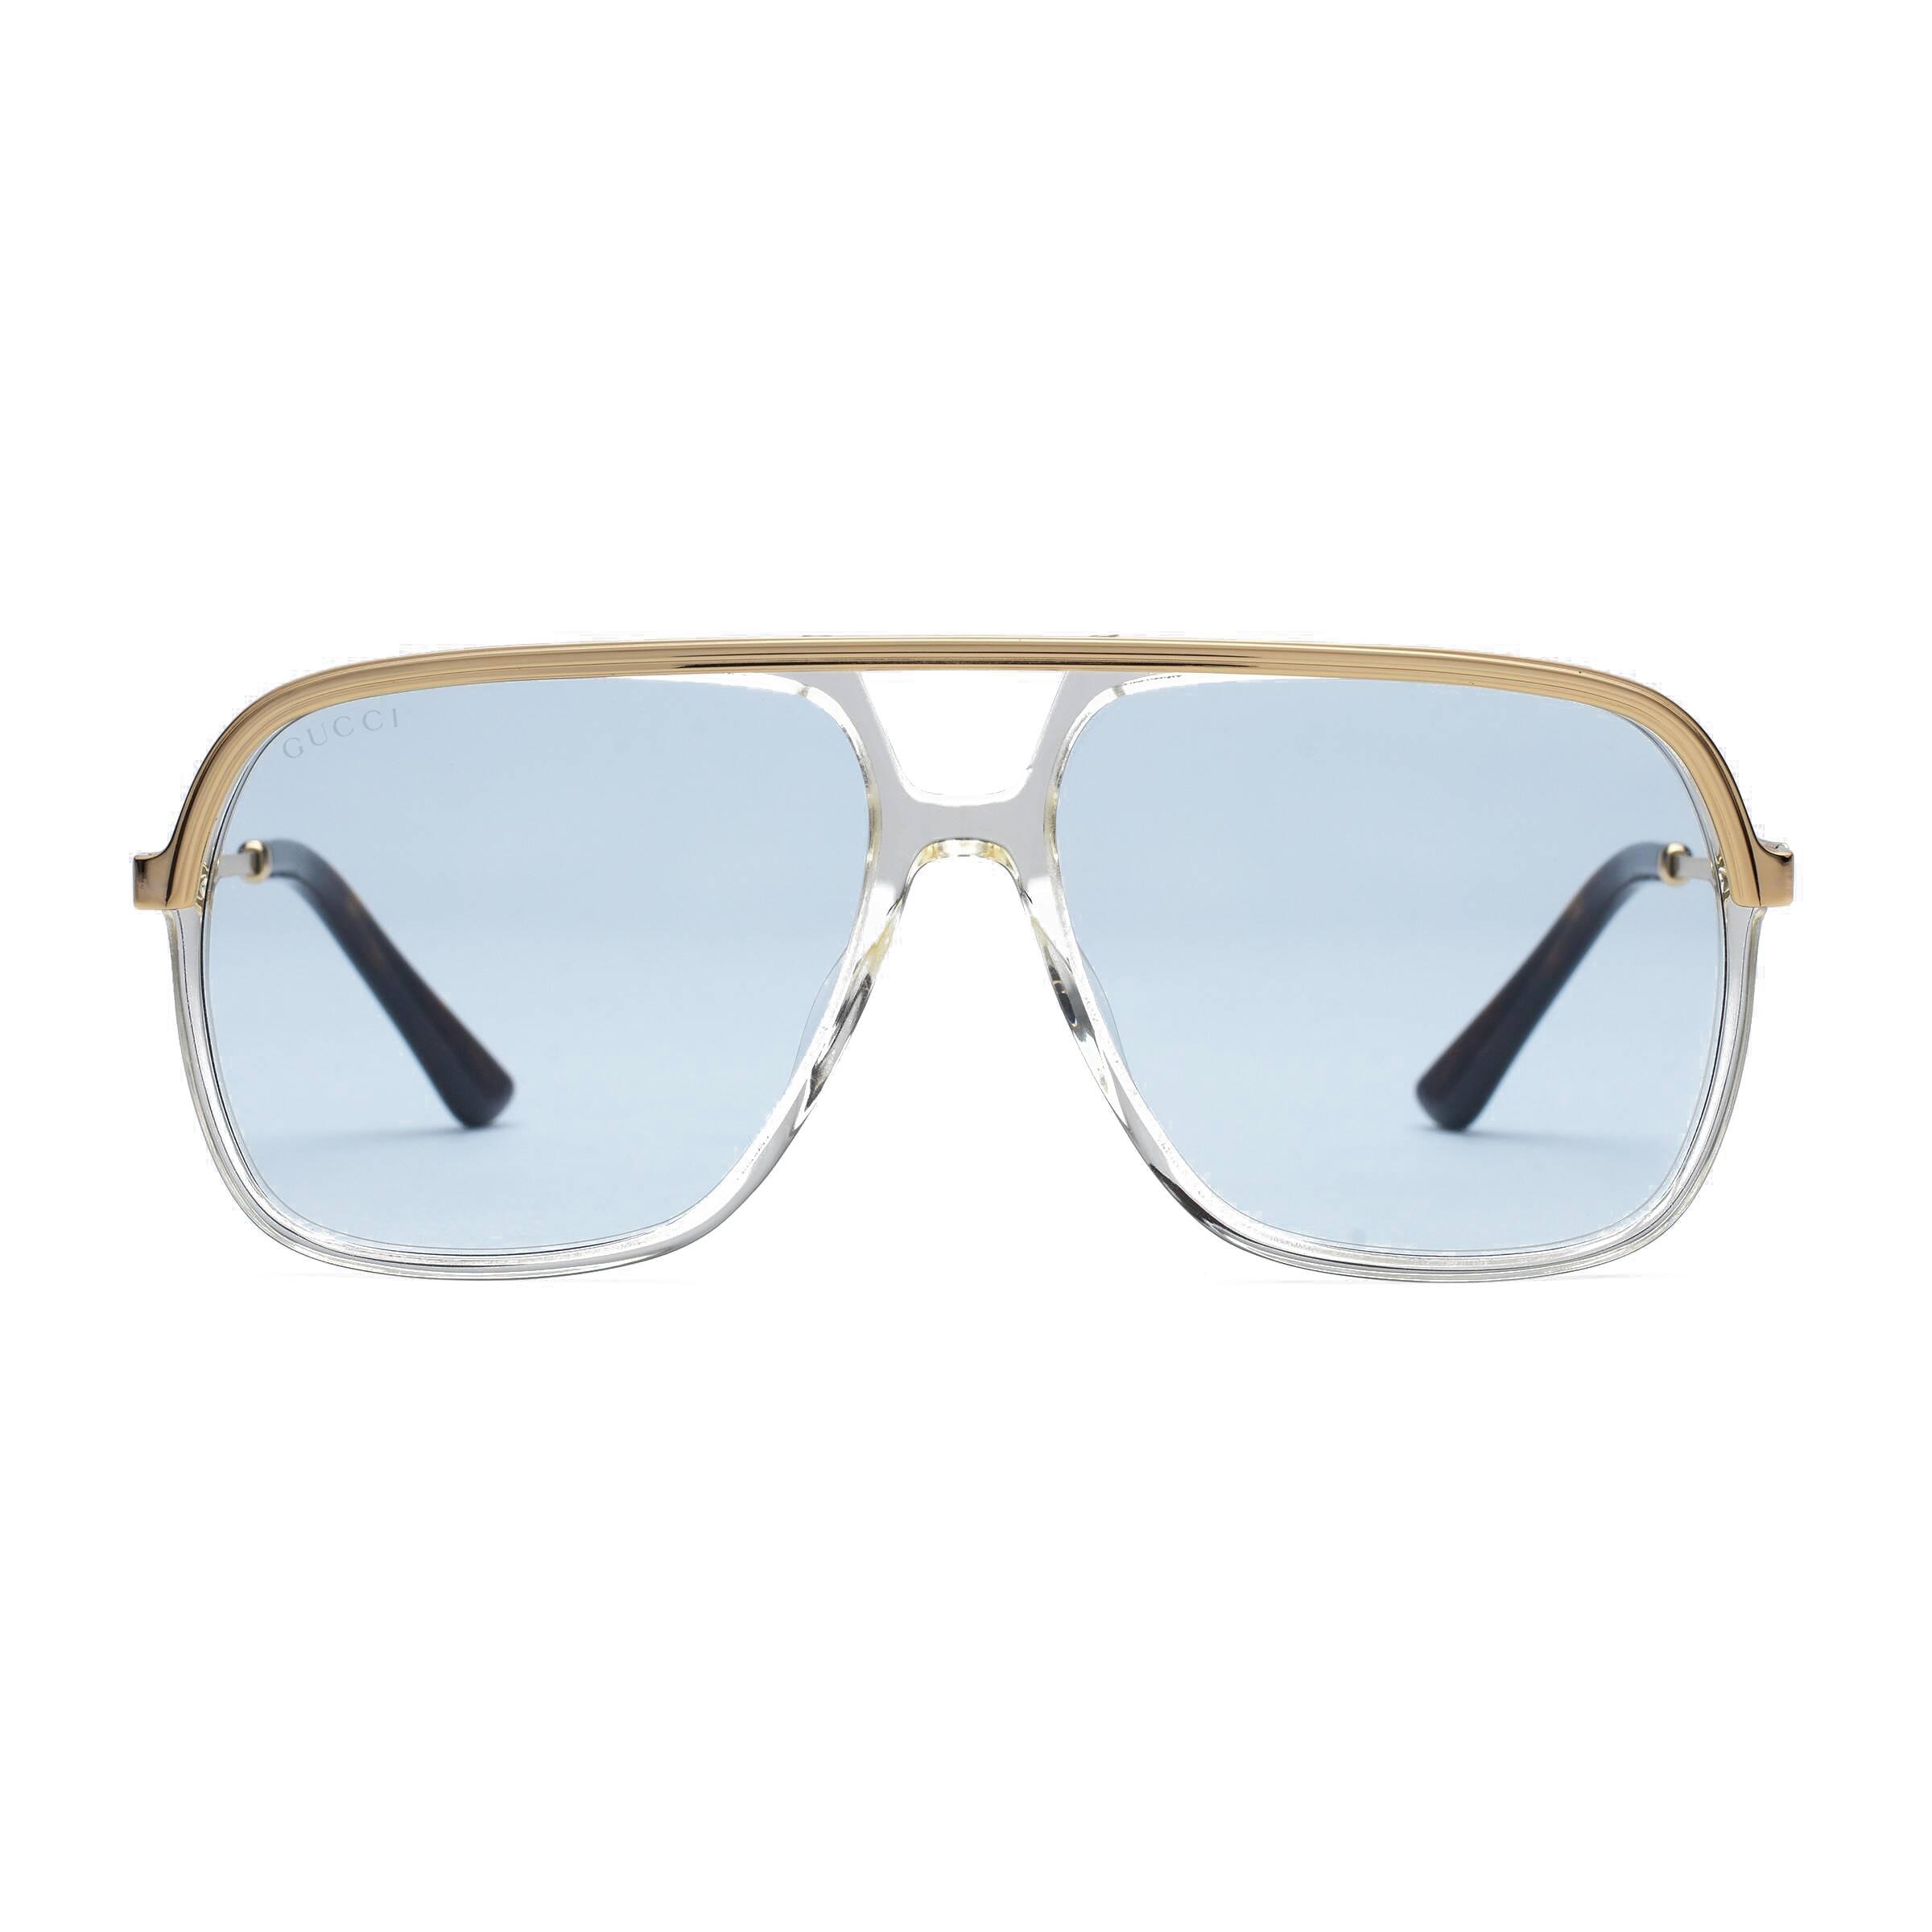 dd5194f3328f Gucci - Metal Rectangular Sunglasses - Pink Fluo - Gucci Eyewear - Avvenice